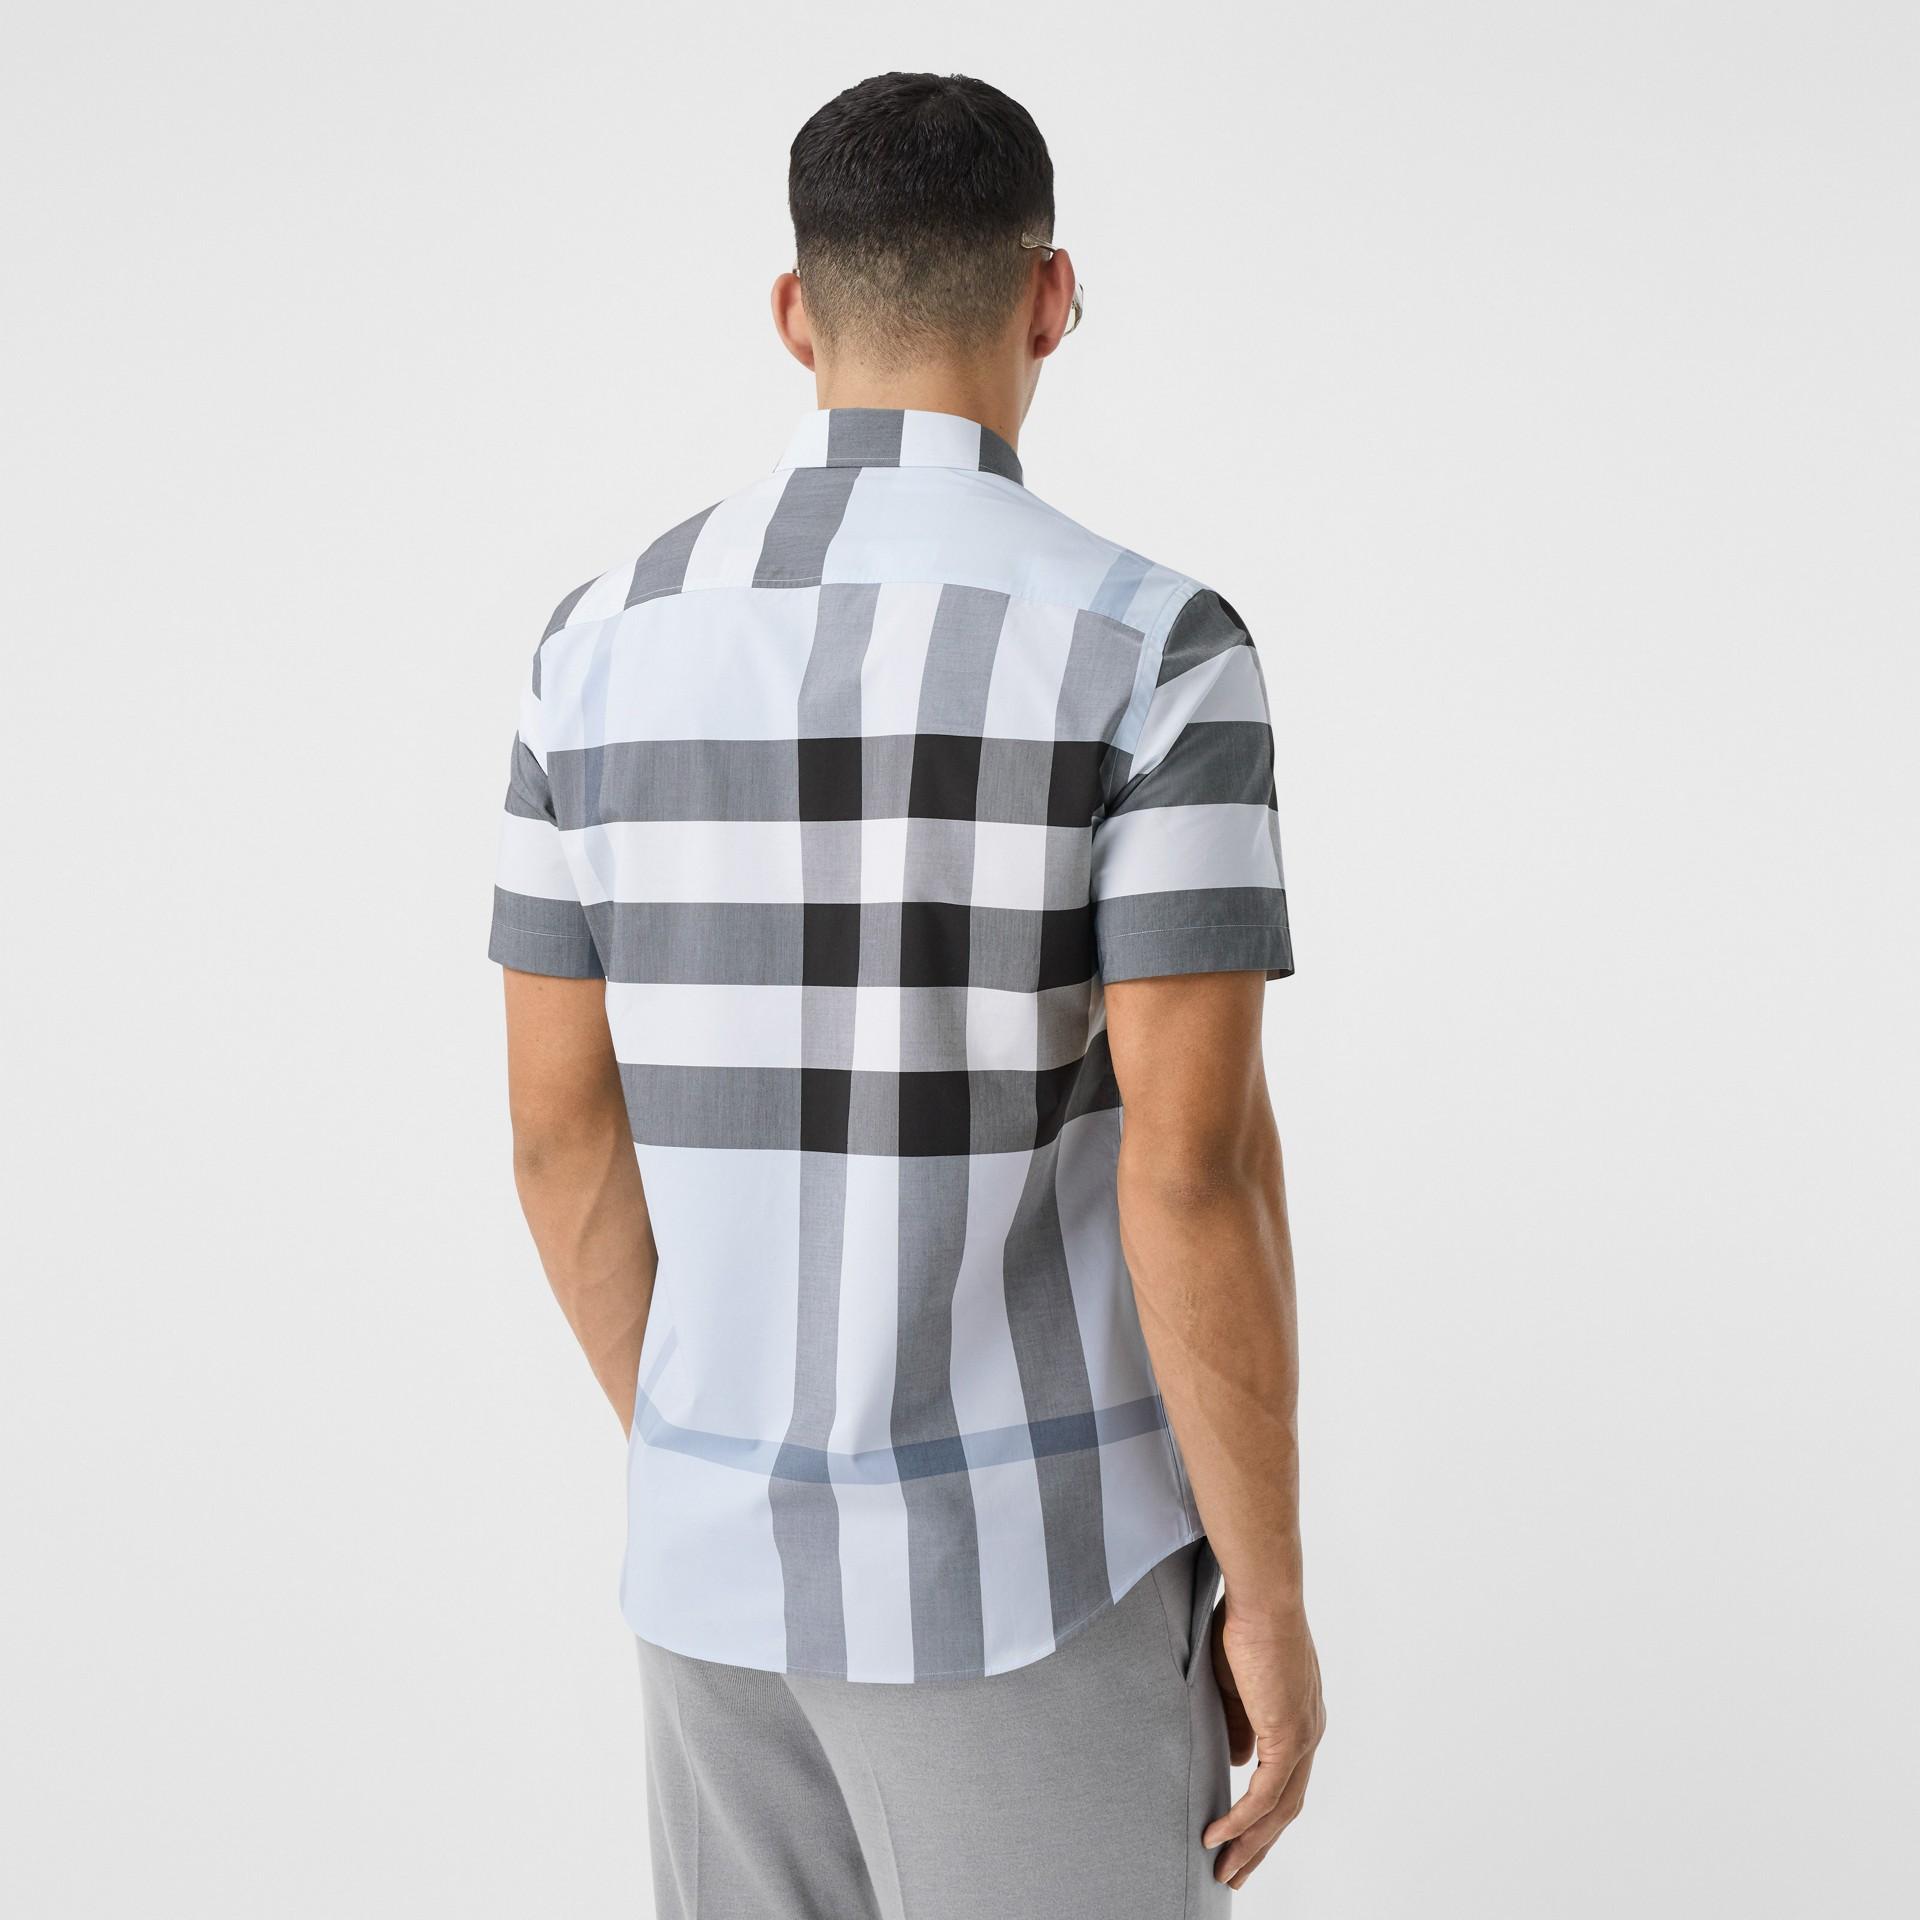 Short-sleeve Check Stretch Cotton Poplin Shirt in Chalk Blue - Men | Burberry Hong Kong S.A.R - gallery image 2